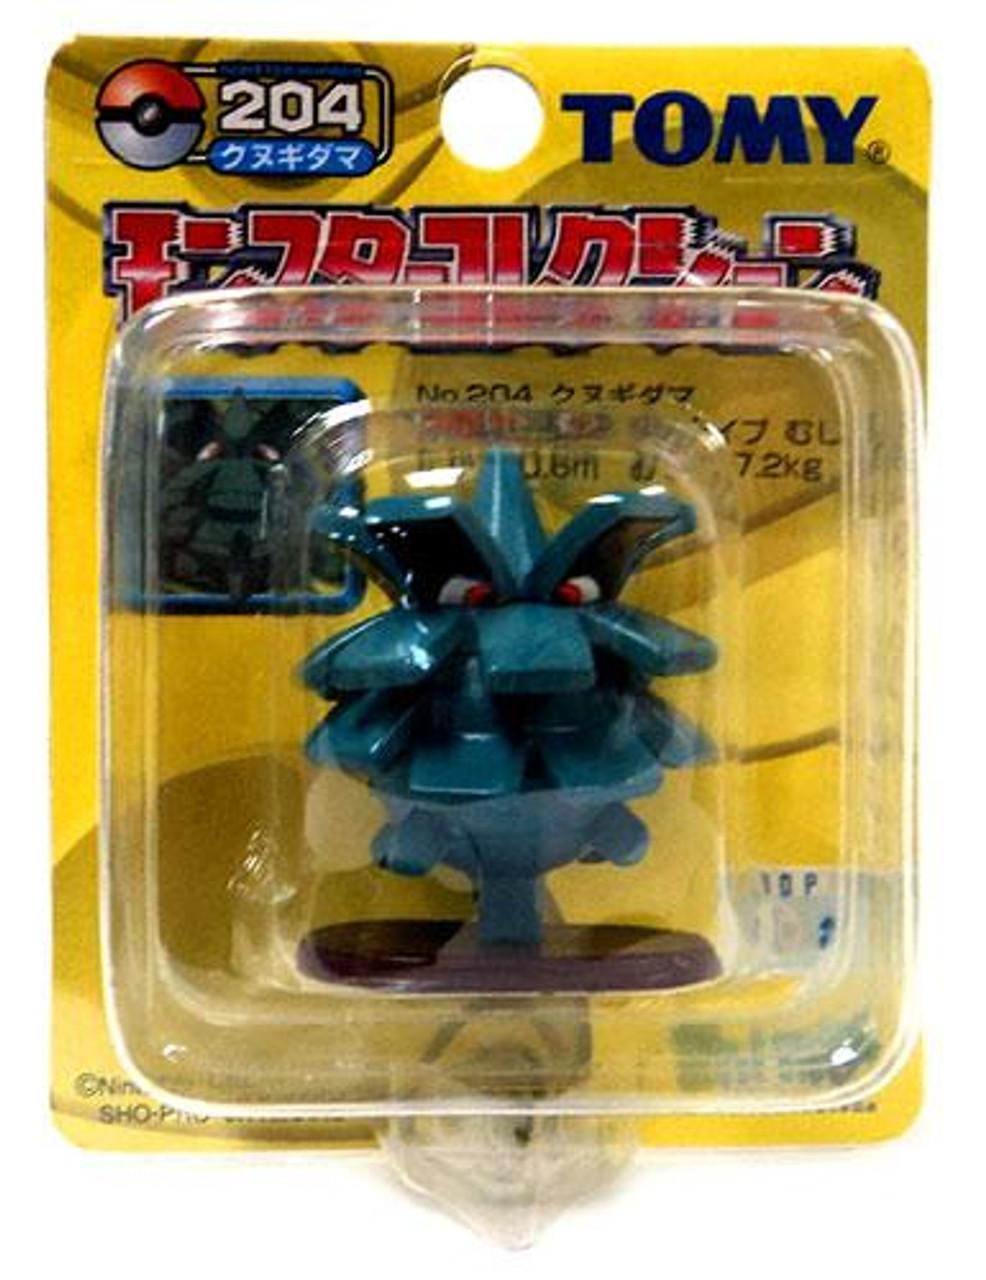 Pokemon Japanese Monster Collection Pineco PVC Figure #204